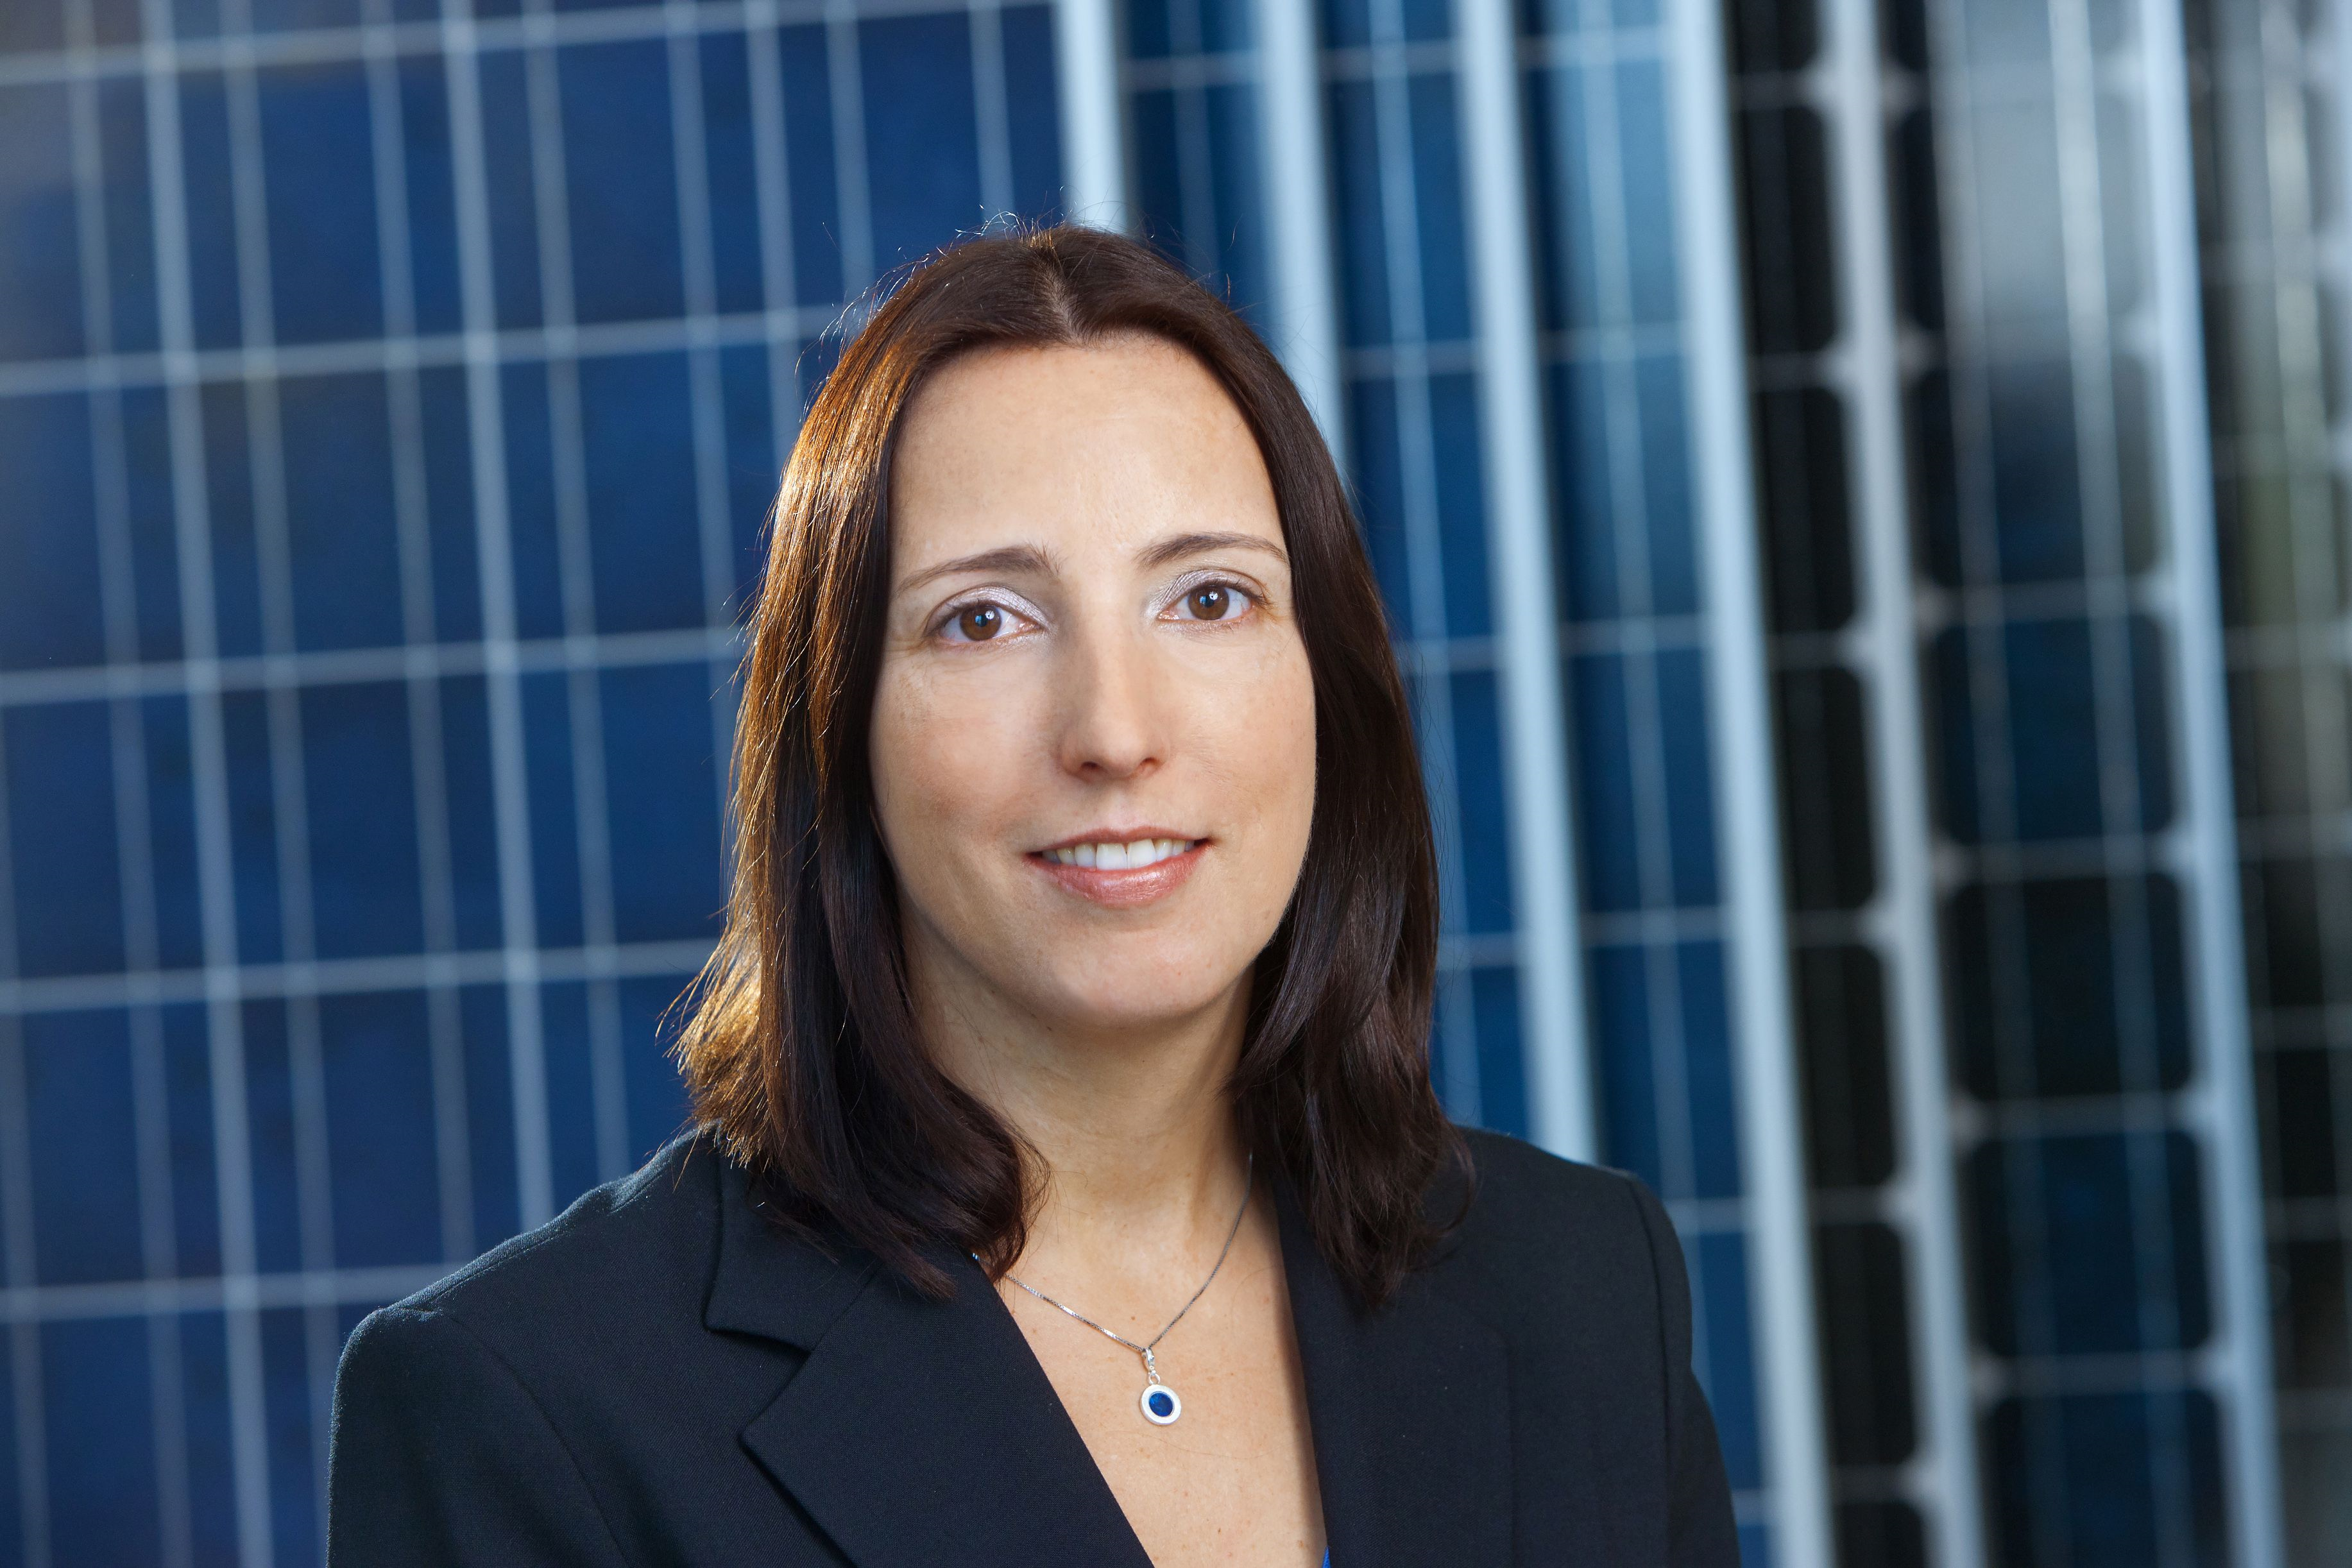 Rita Ebner Profilbild